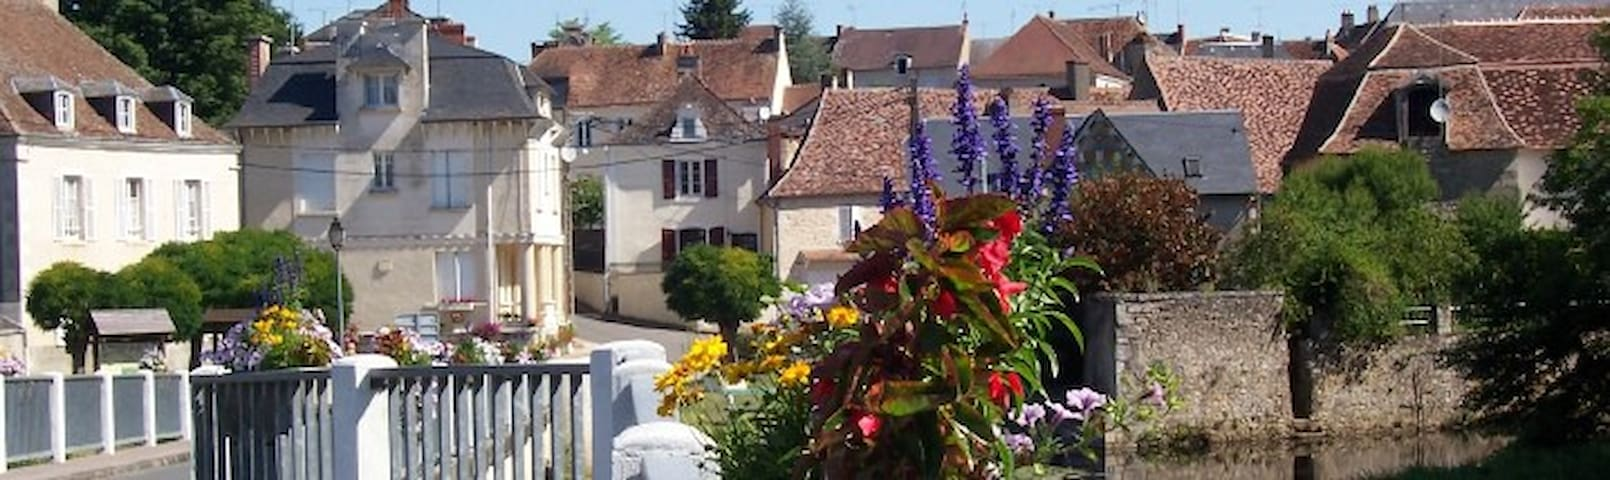 Tranquil central location, Belabre, Indre, France - Bélâbre - Huis